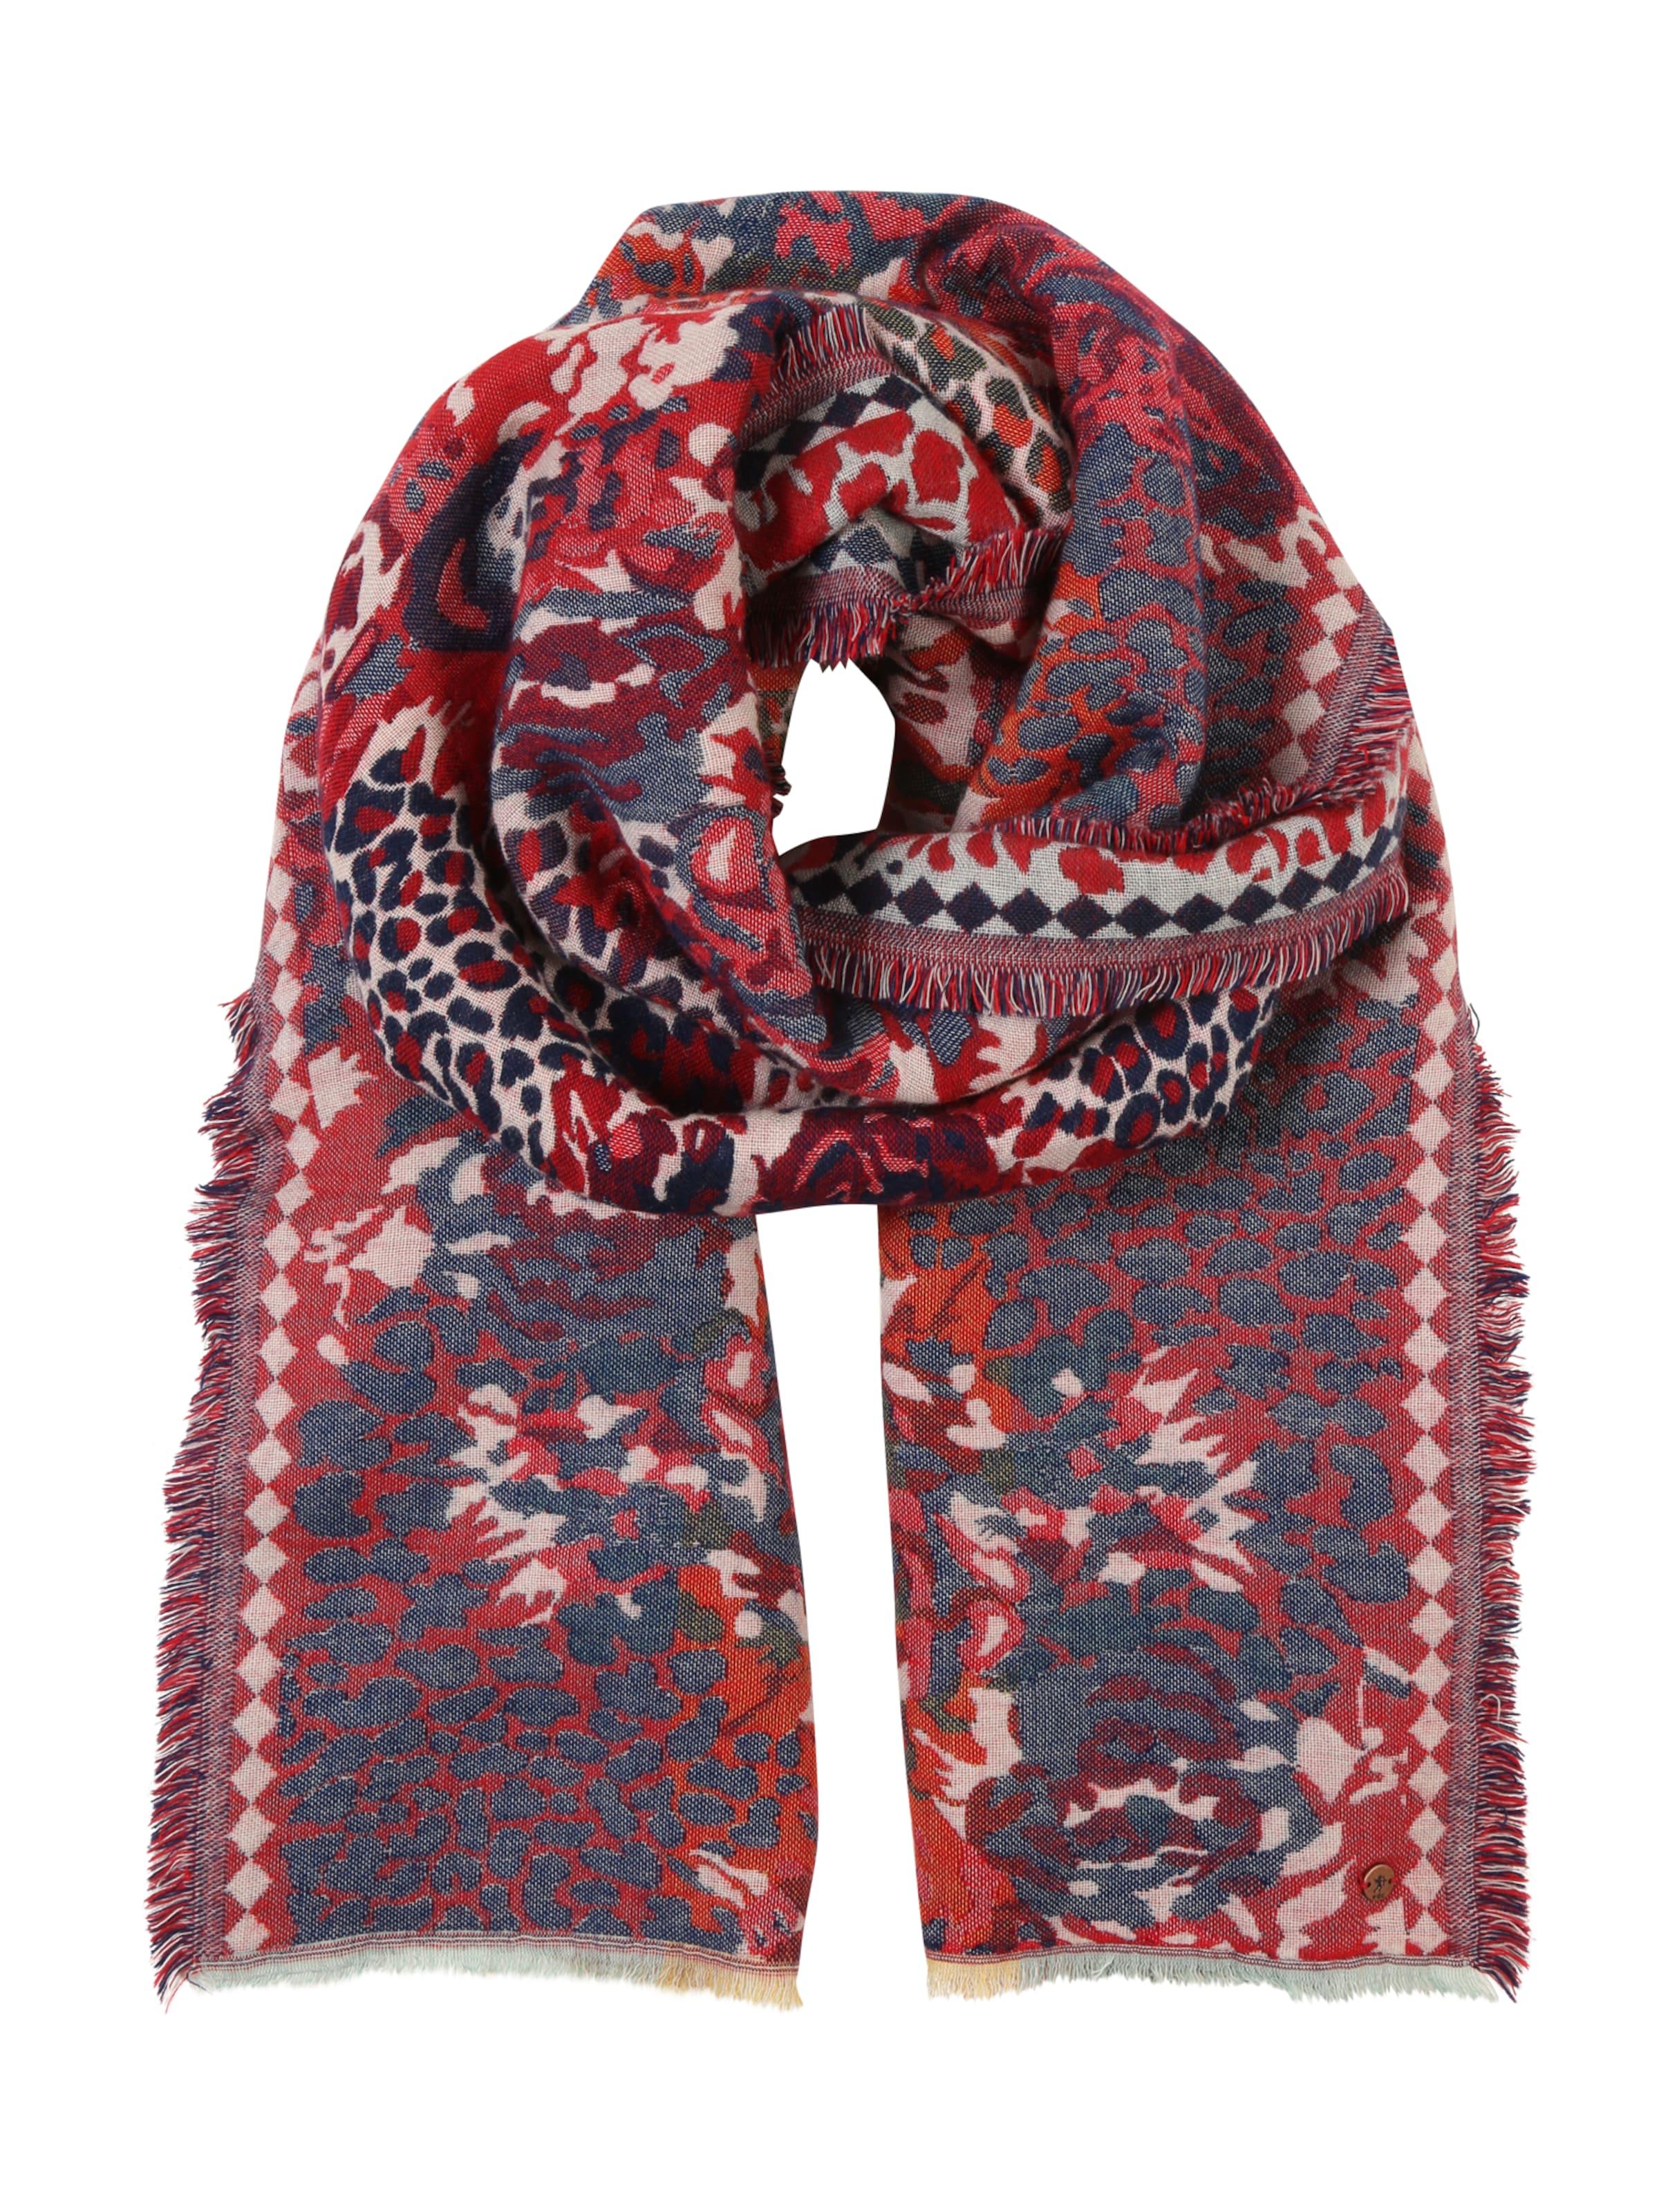 'leojaqua' Schal Rot Esprit 'leojaqua' Rot Esprit Schal In In Esprit OPkw08n